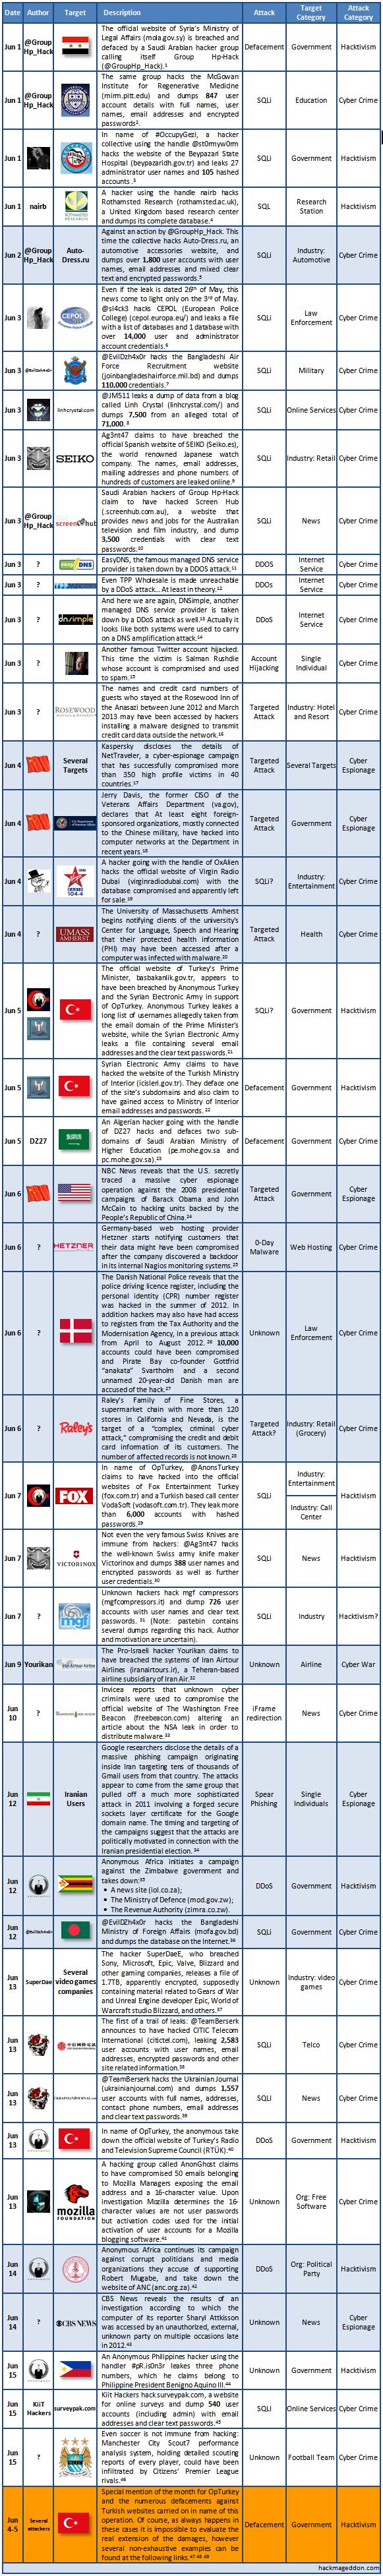 1-15 June 2013 Cyber Atacks Timeline